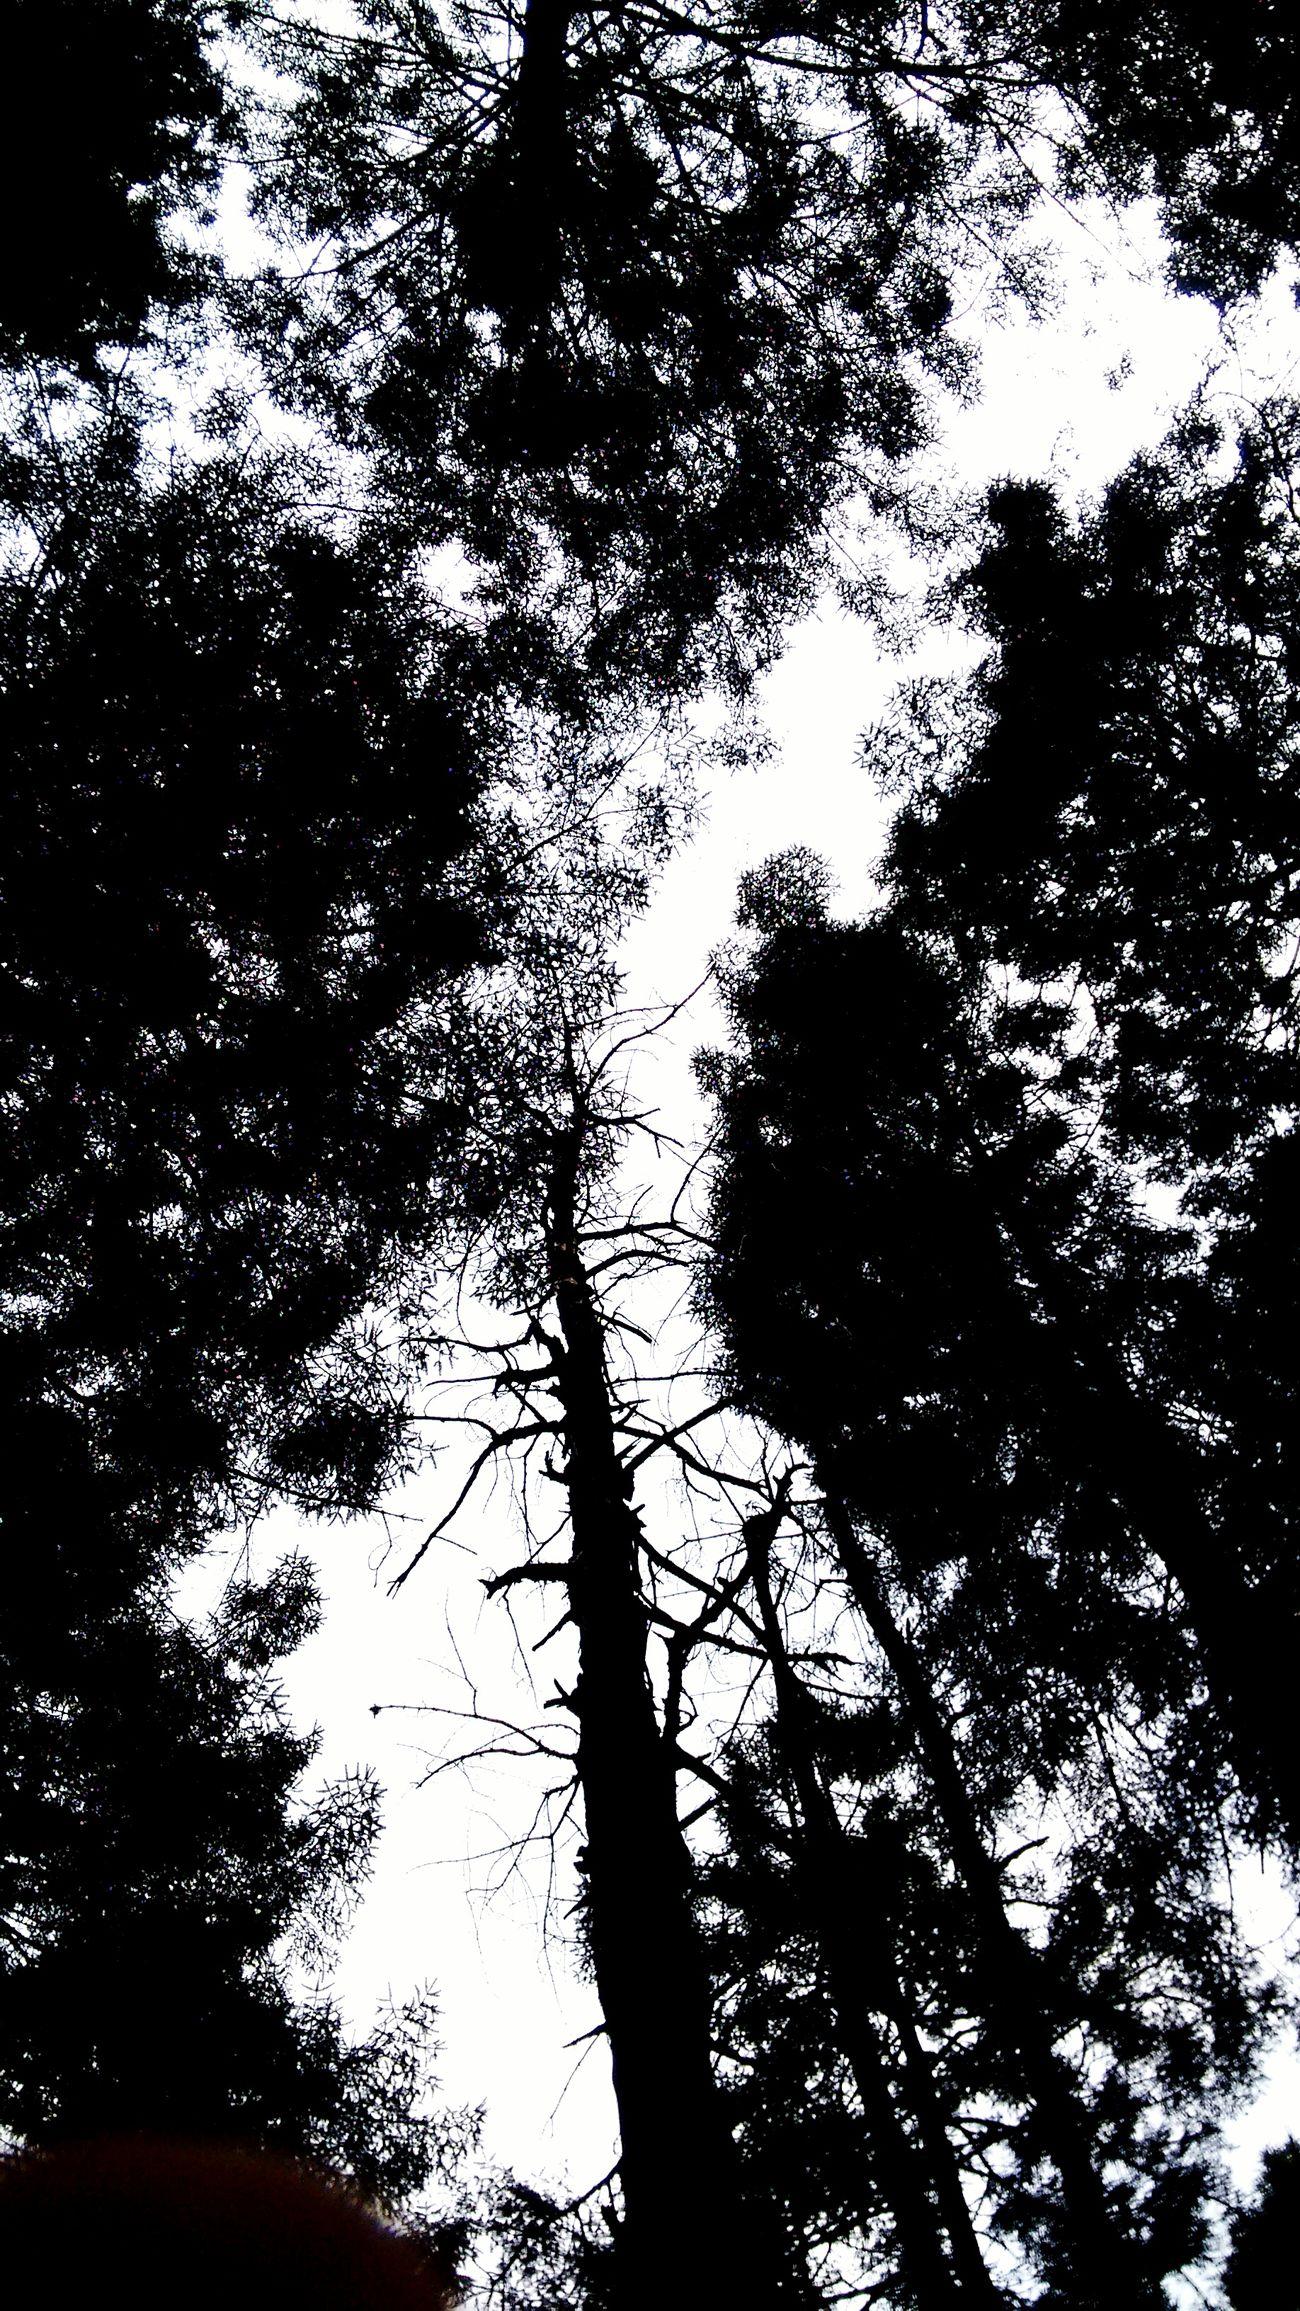 Alucination LSD Hofmann Viaje Psicodelic TRYPTpic Trip Photos Galaxy Space Day Astronomy Beauty Sky Blue Beauty In Nature Nature Atardecerporelmundo Cloud - Sky Hello World Bosque Encantado Bosque Negro Bosque Y Vida